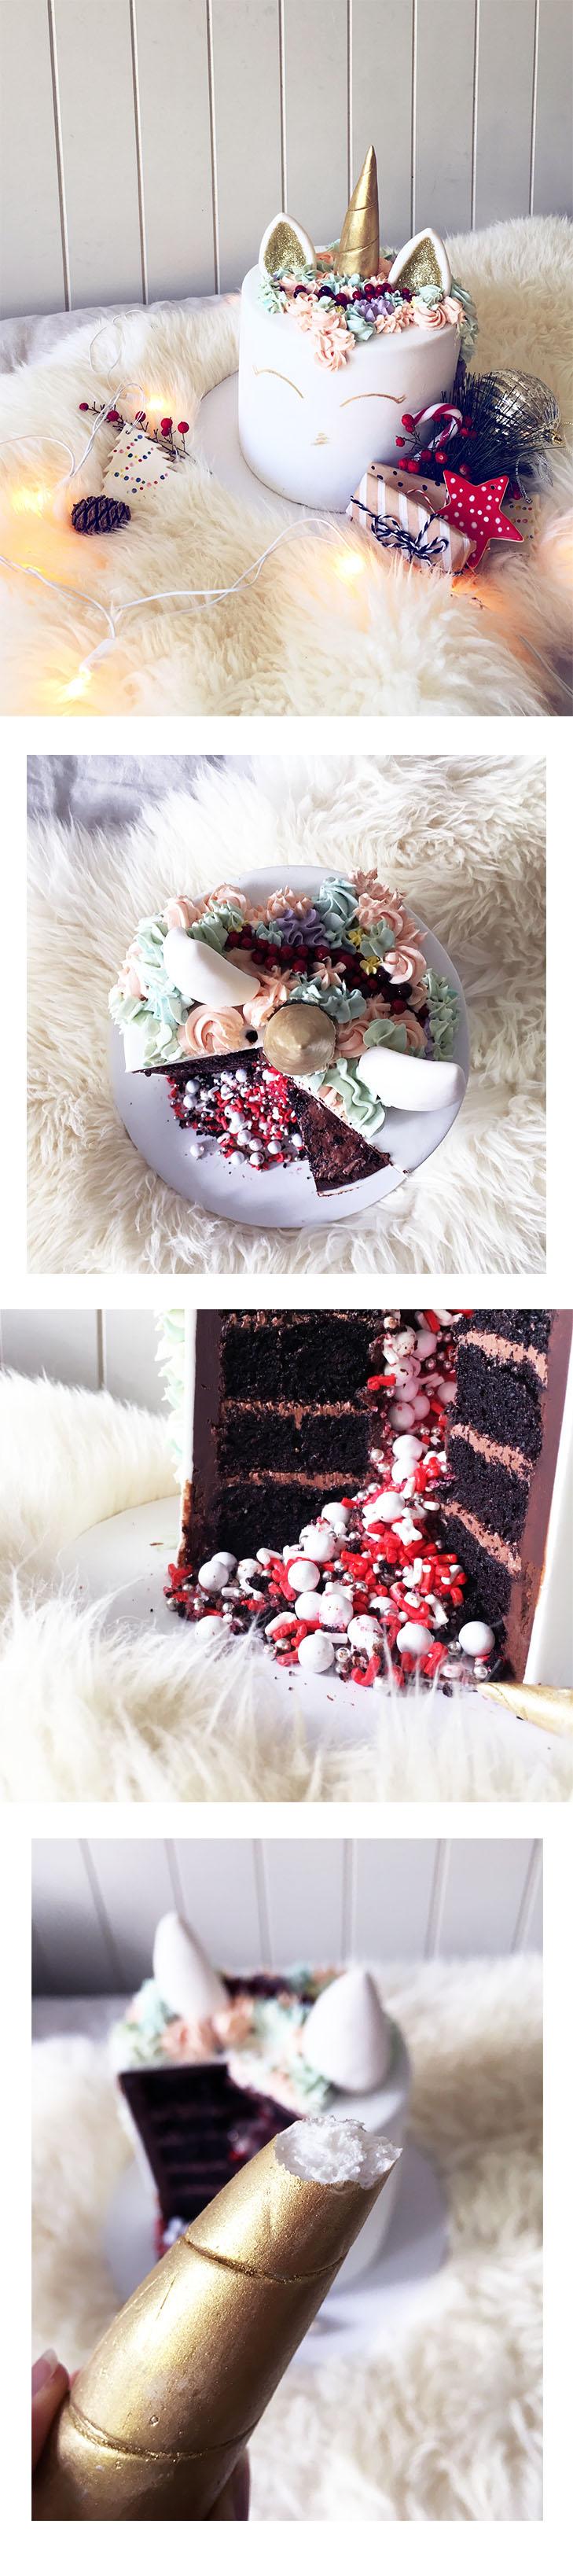 unicorn cake christmas by La Petite Pops x Hello Miss May